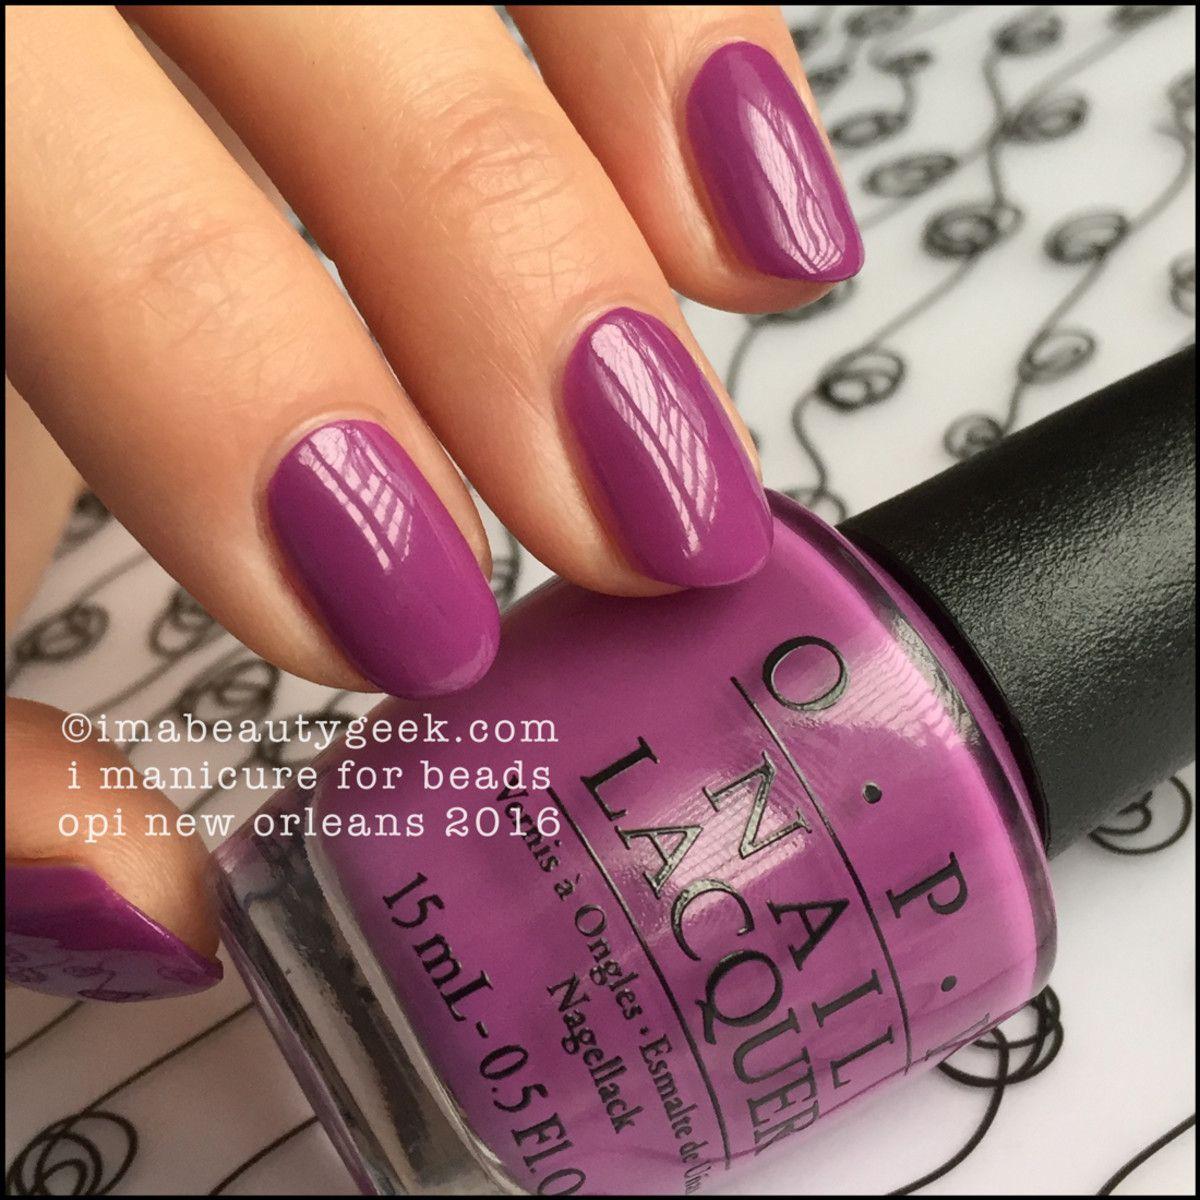 My favorite color! I get compliments everytime I wear it. OPI I ...